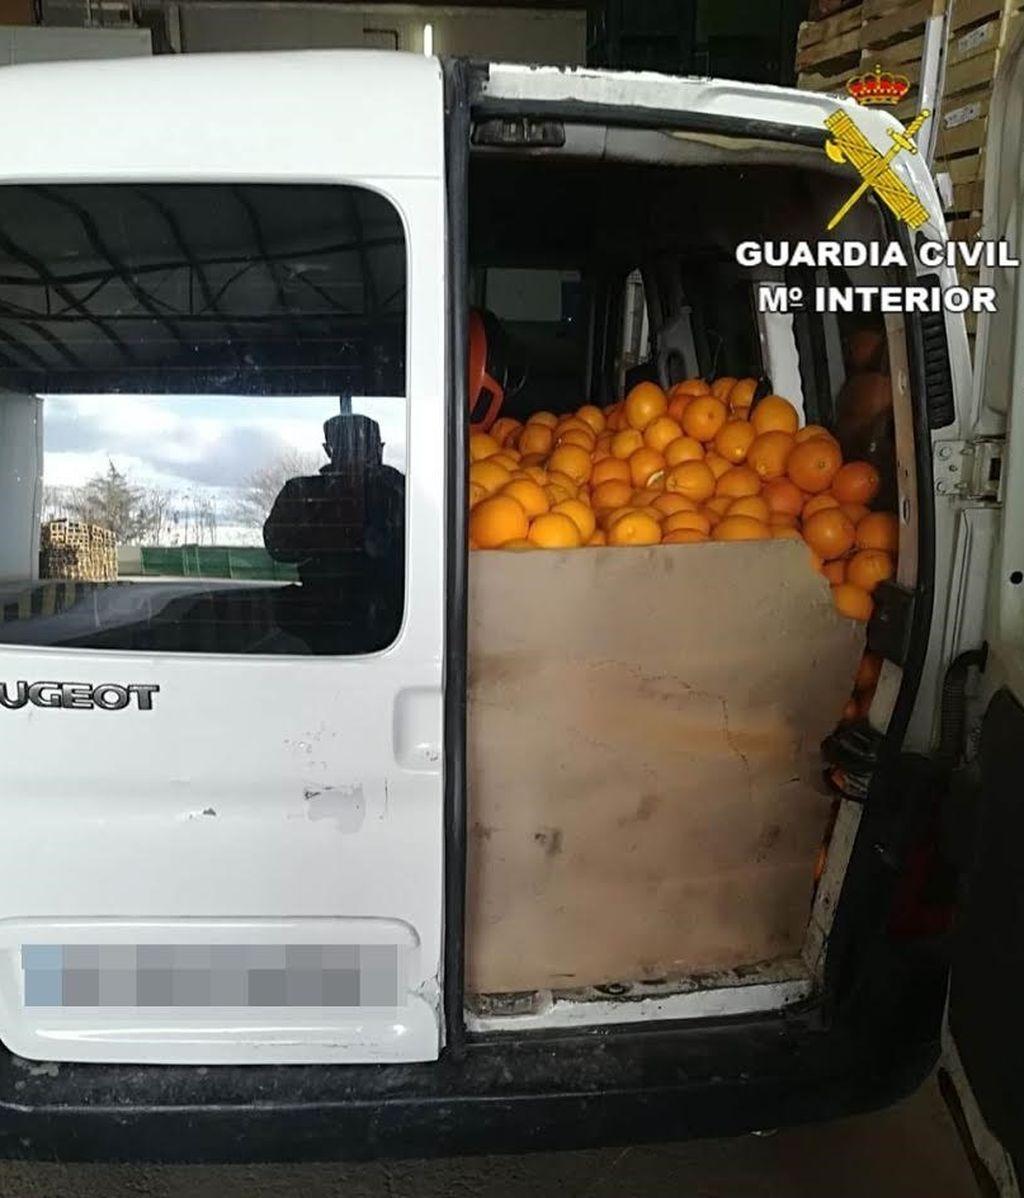 Investigados tres hombres por robar 14 toneladas de naranjas en Valencia